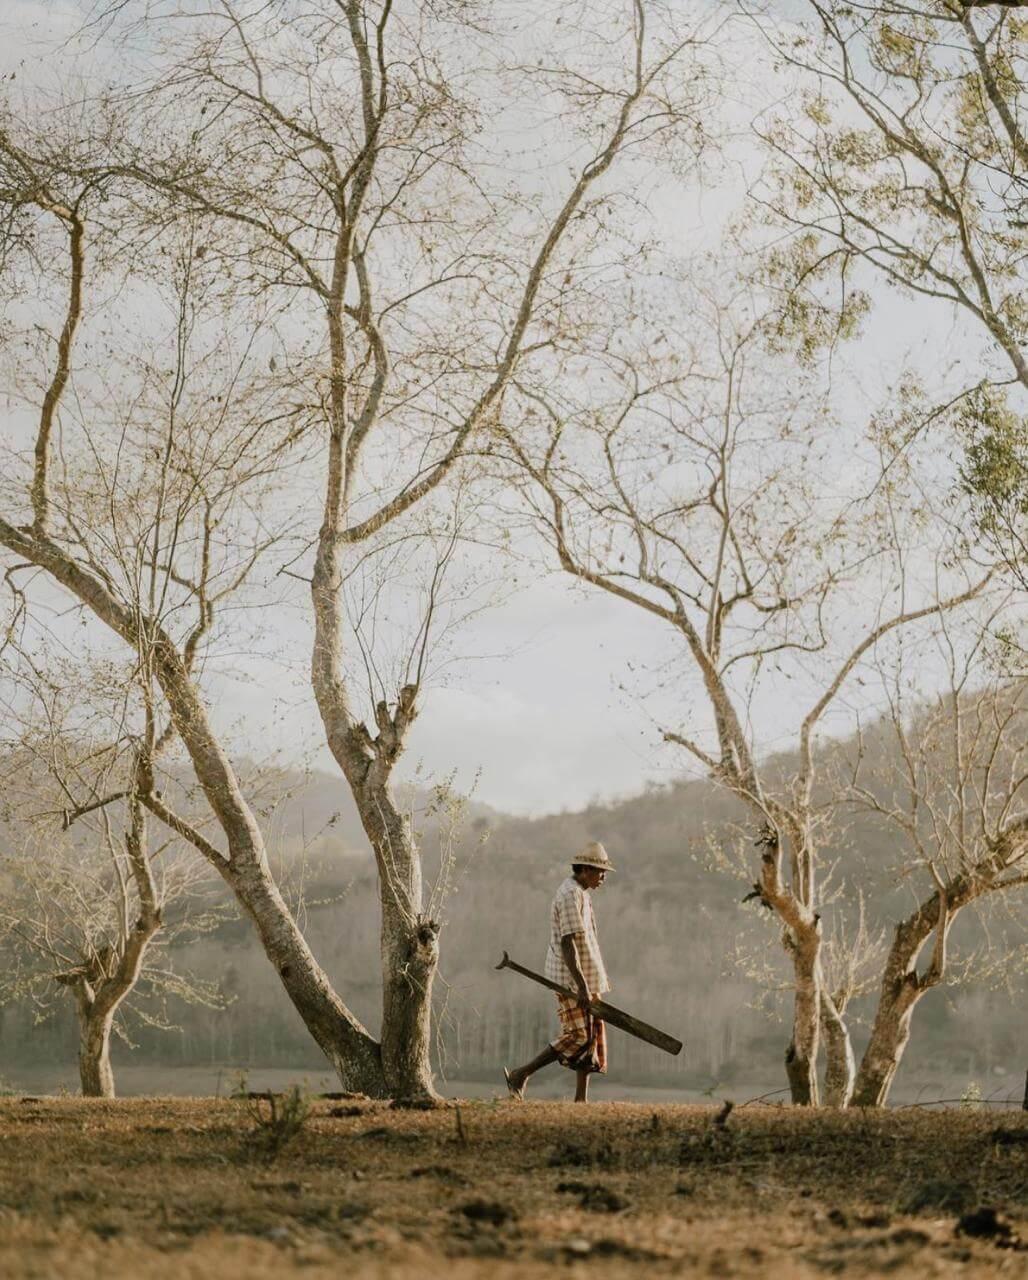 Sahabat Perjalananmu X TelusuRI: Ngobrolin Fotografi Perjalanan bareng Ingga Suwandana